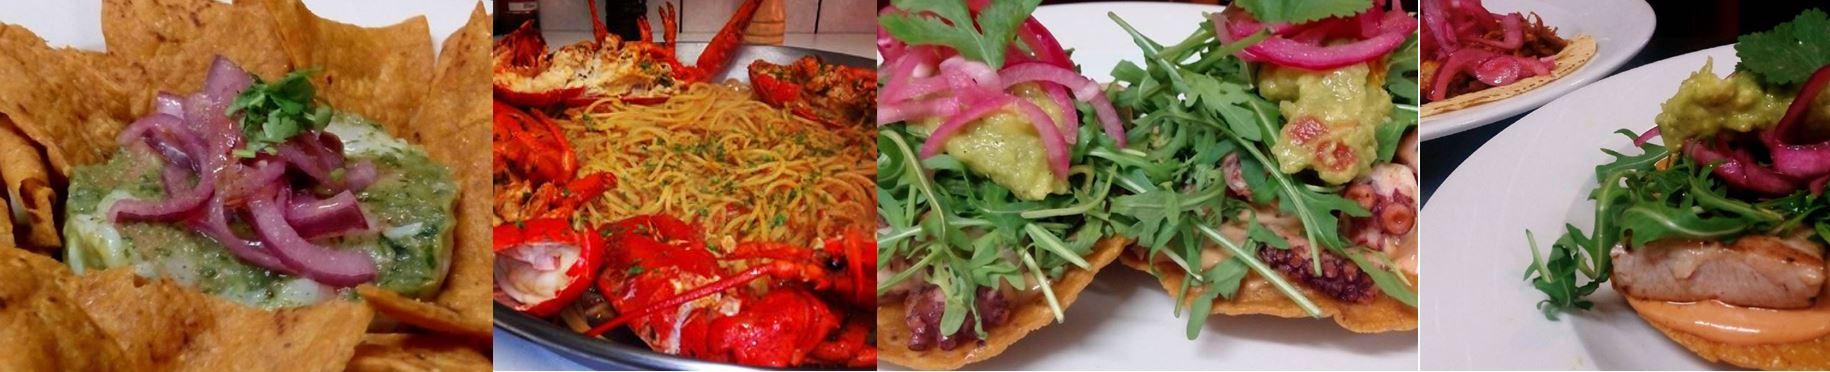 benjamin morales chef the way magazine